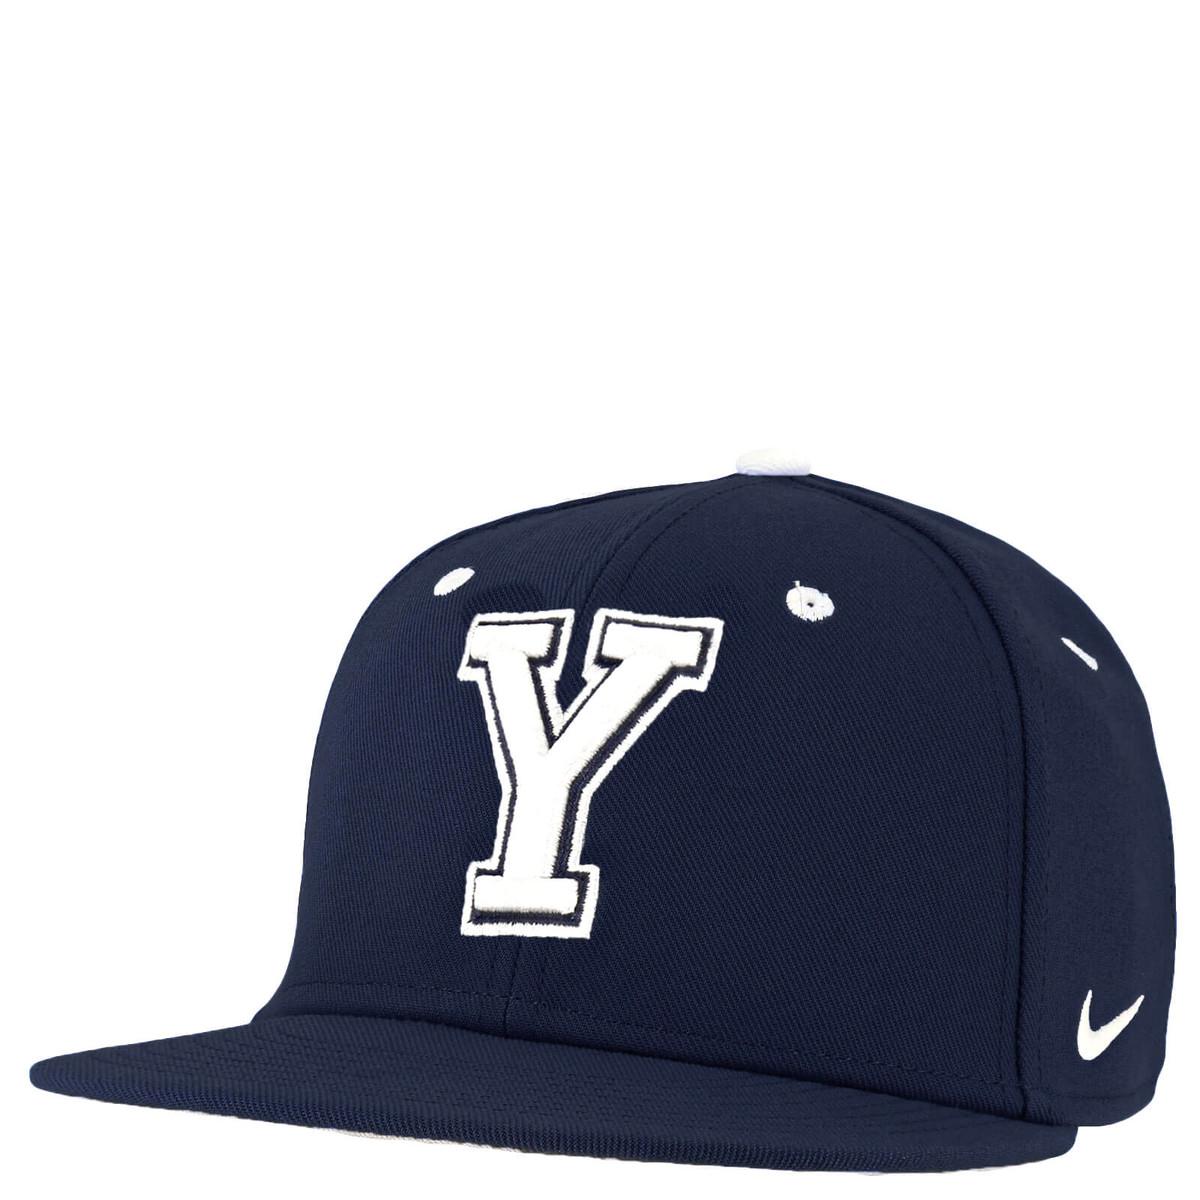 nike 2016 baseball team cap